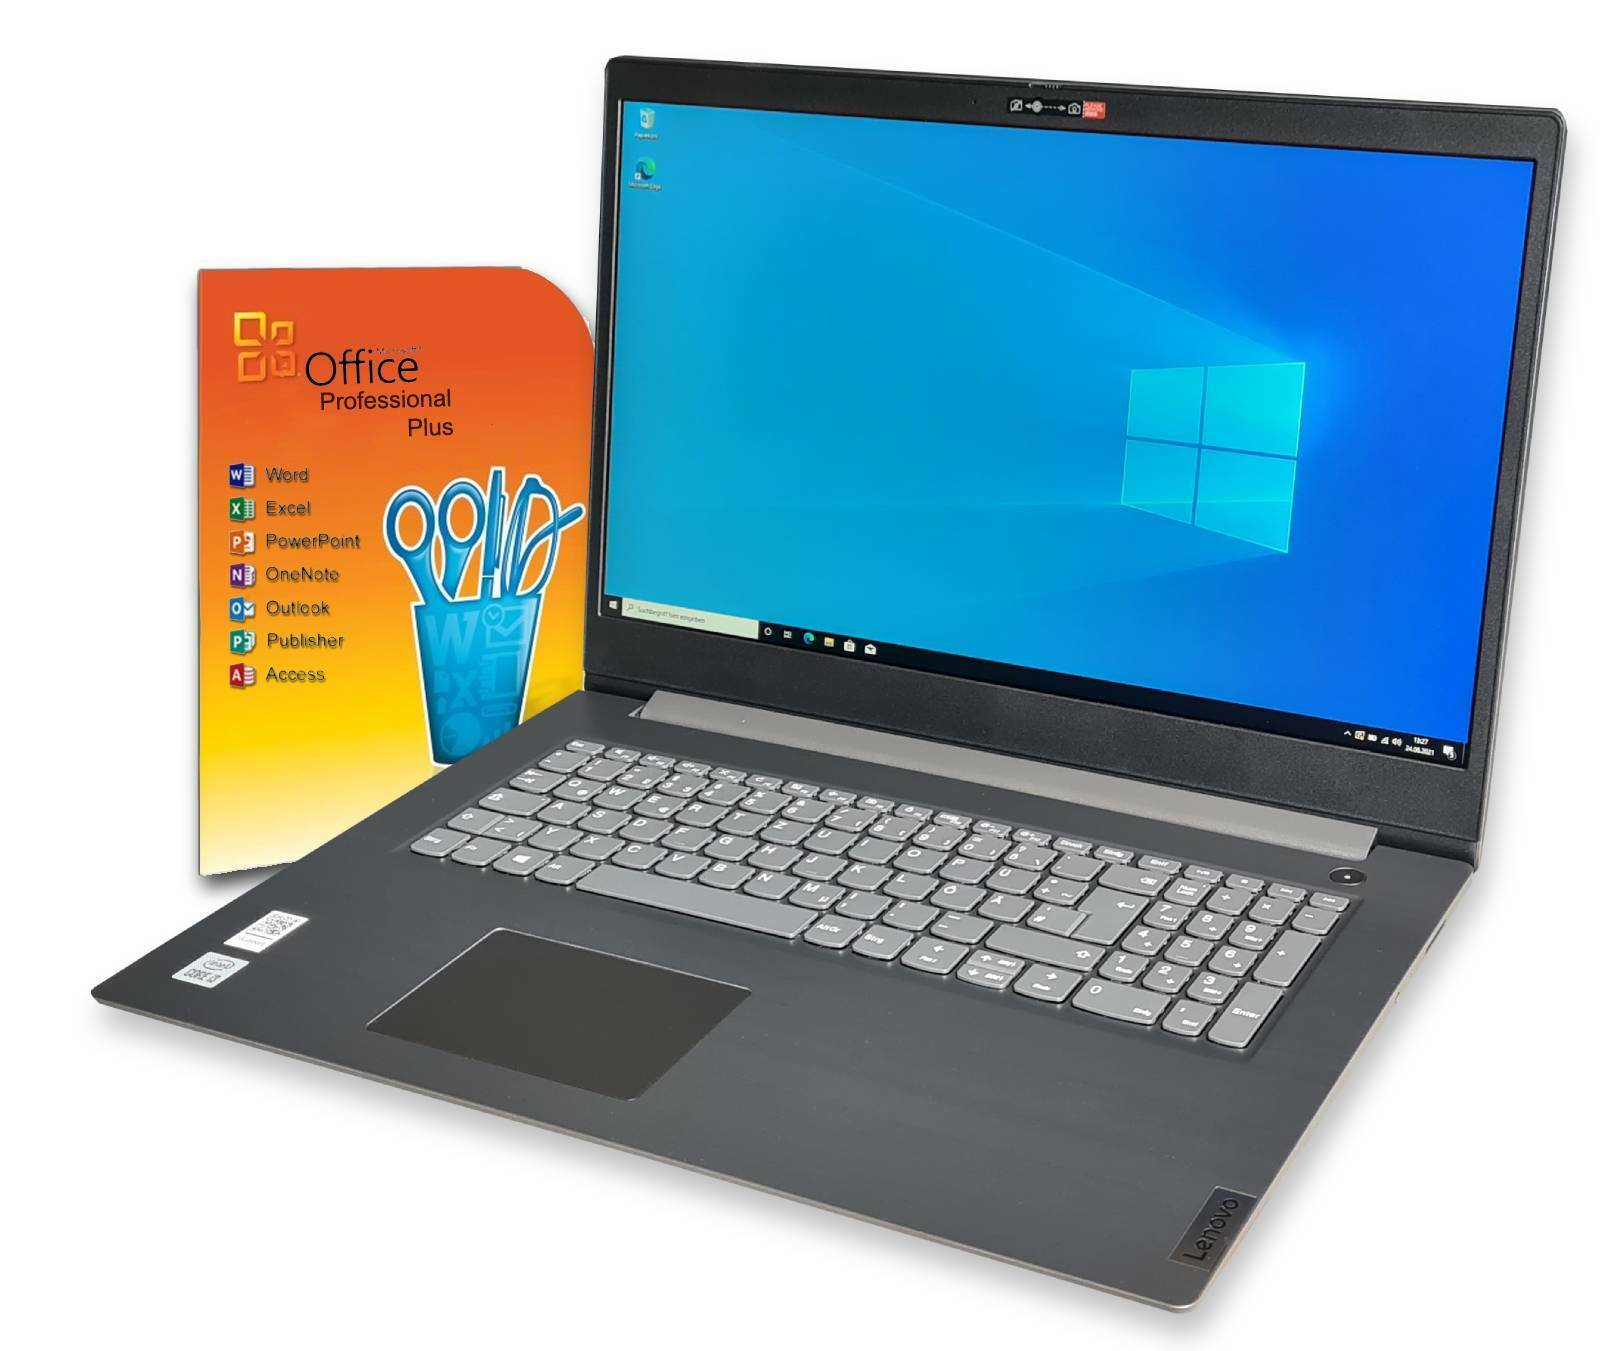 Notebook 17 Zoll Lenovo i3 / 8GB /512SSD IPS /Full HD / Win10 Pro / Office 2019